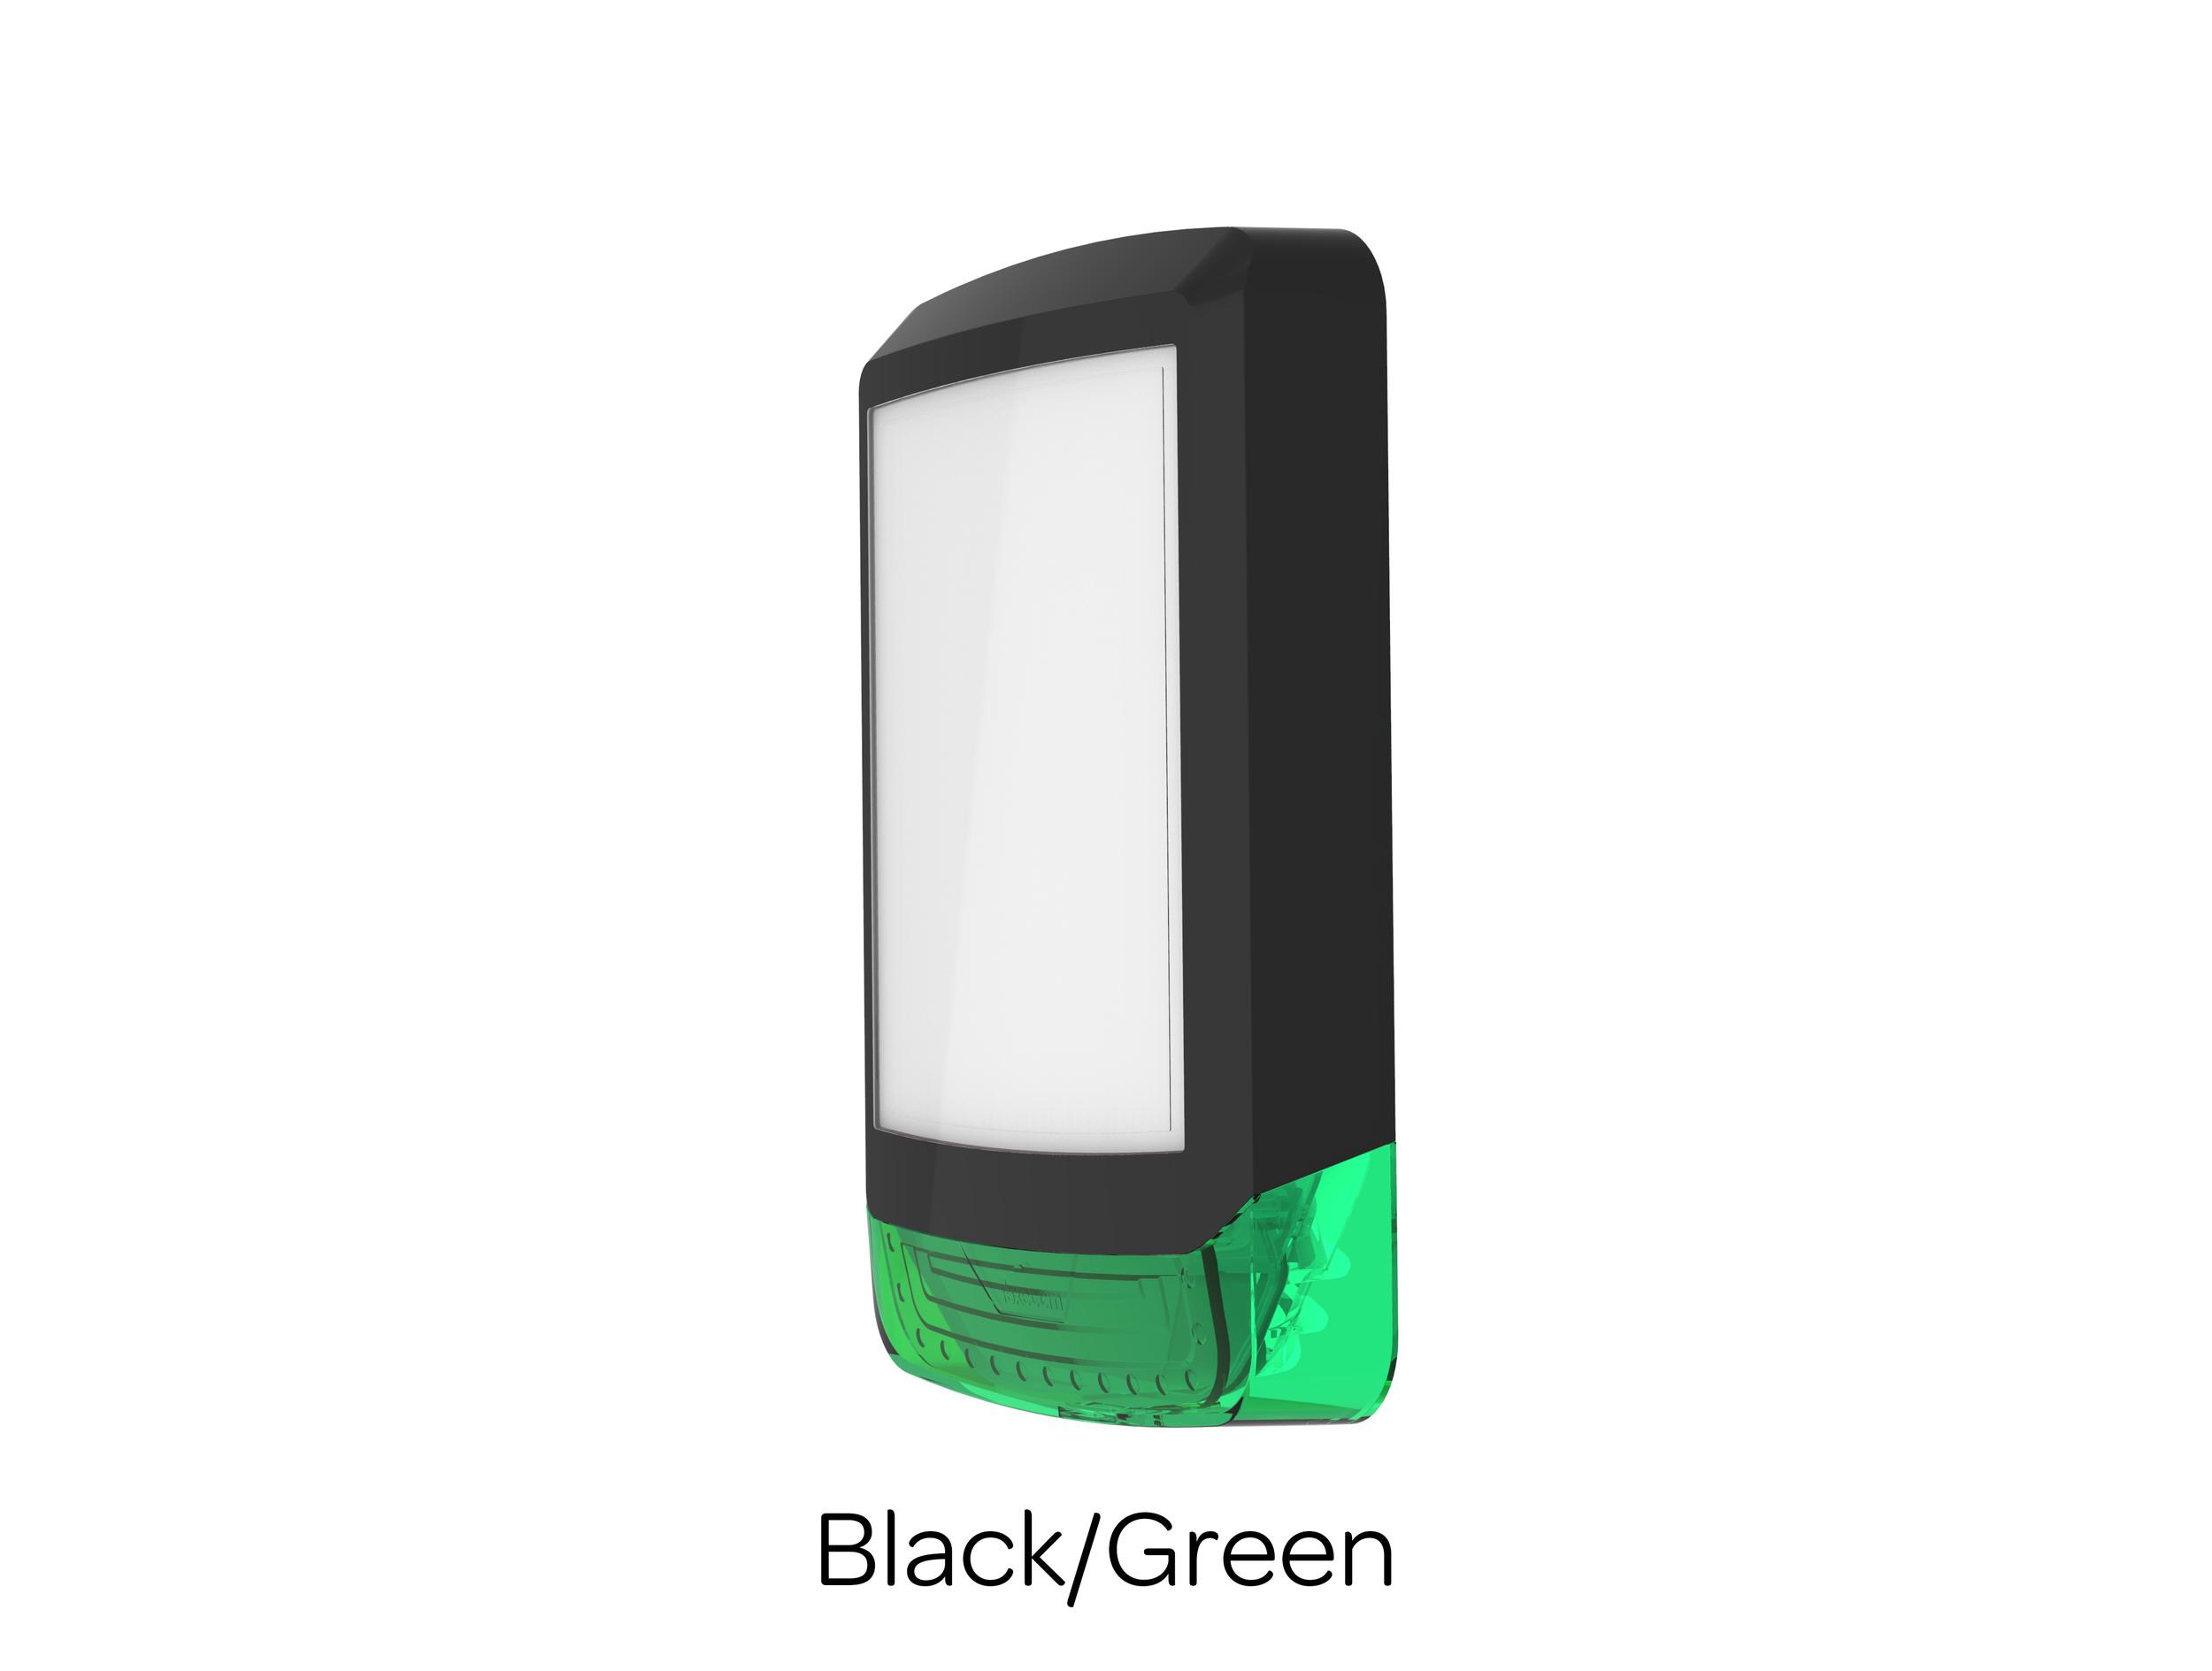 Web_OdyX1_Black-Green_WhiteBG.jpg